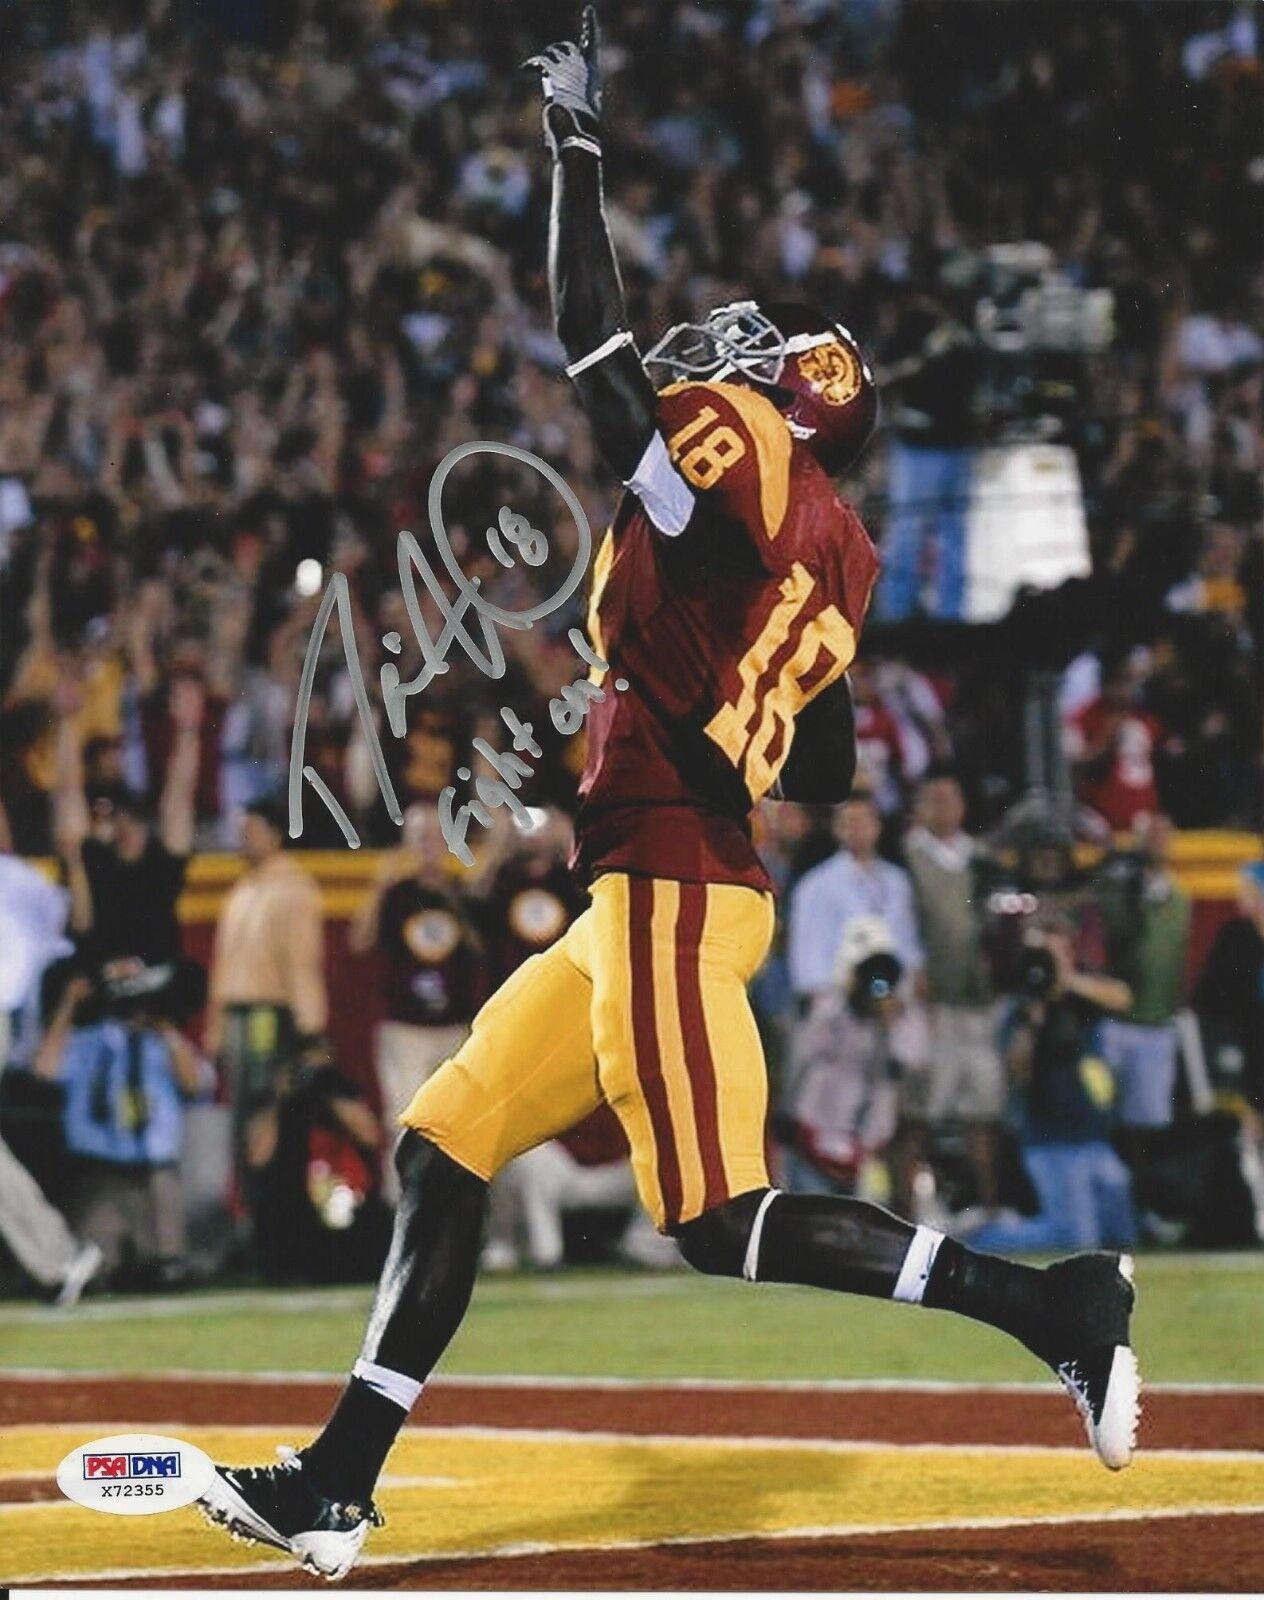 Damien Williams USC Trojans signed 8x10 photo PSA/DNA #X72355